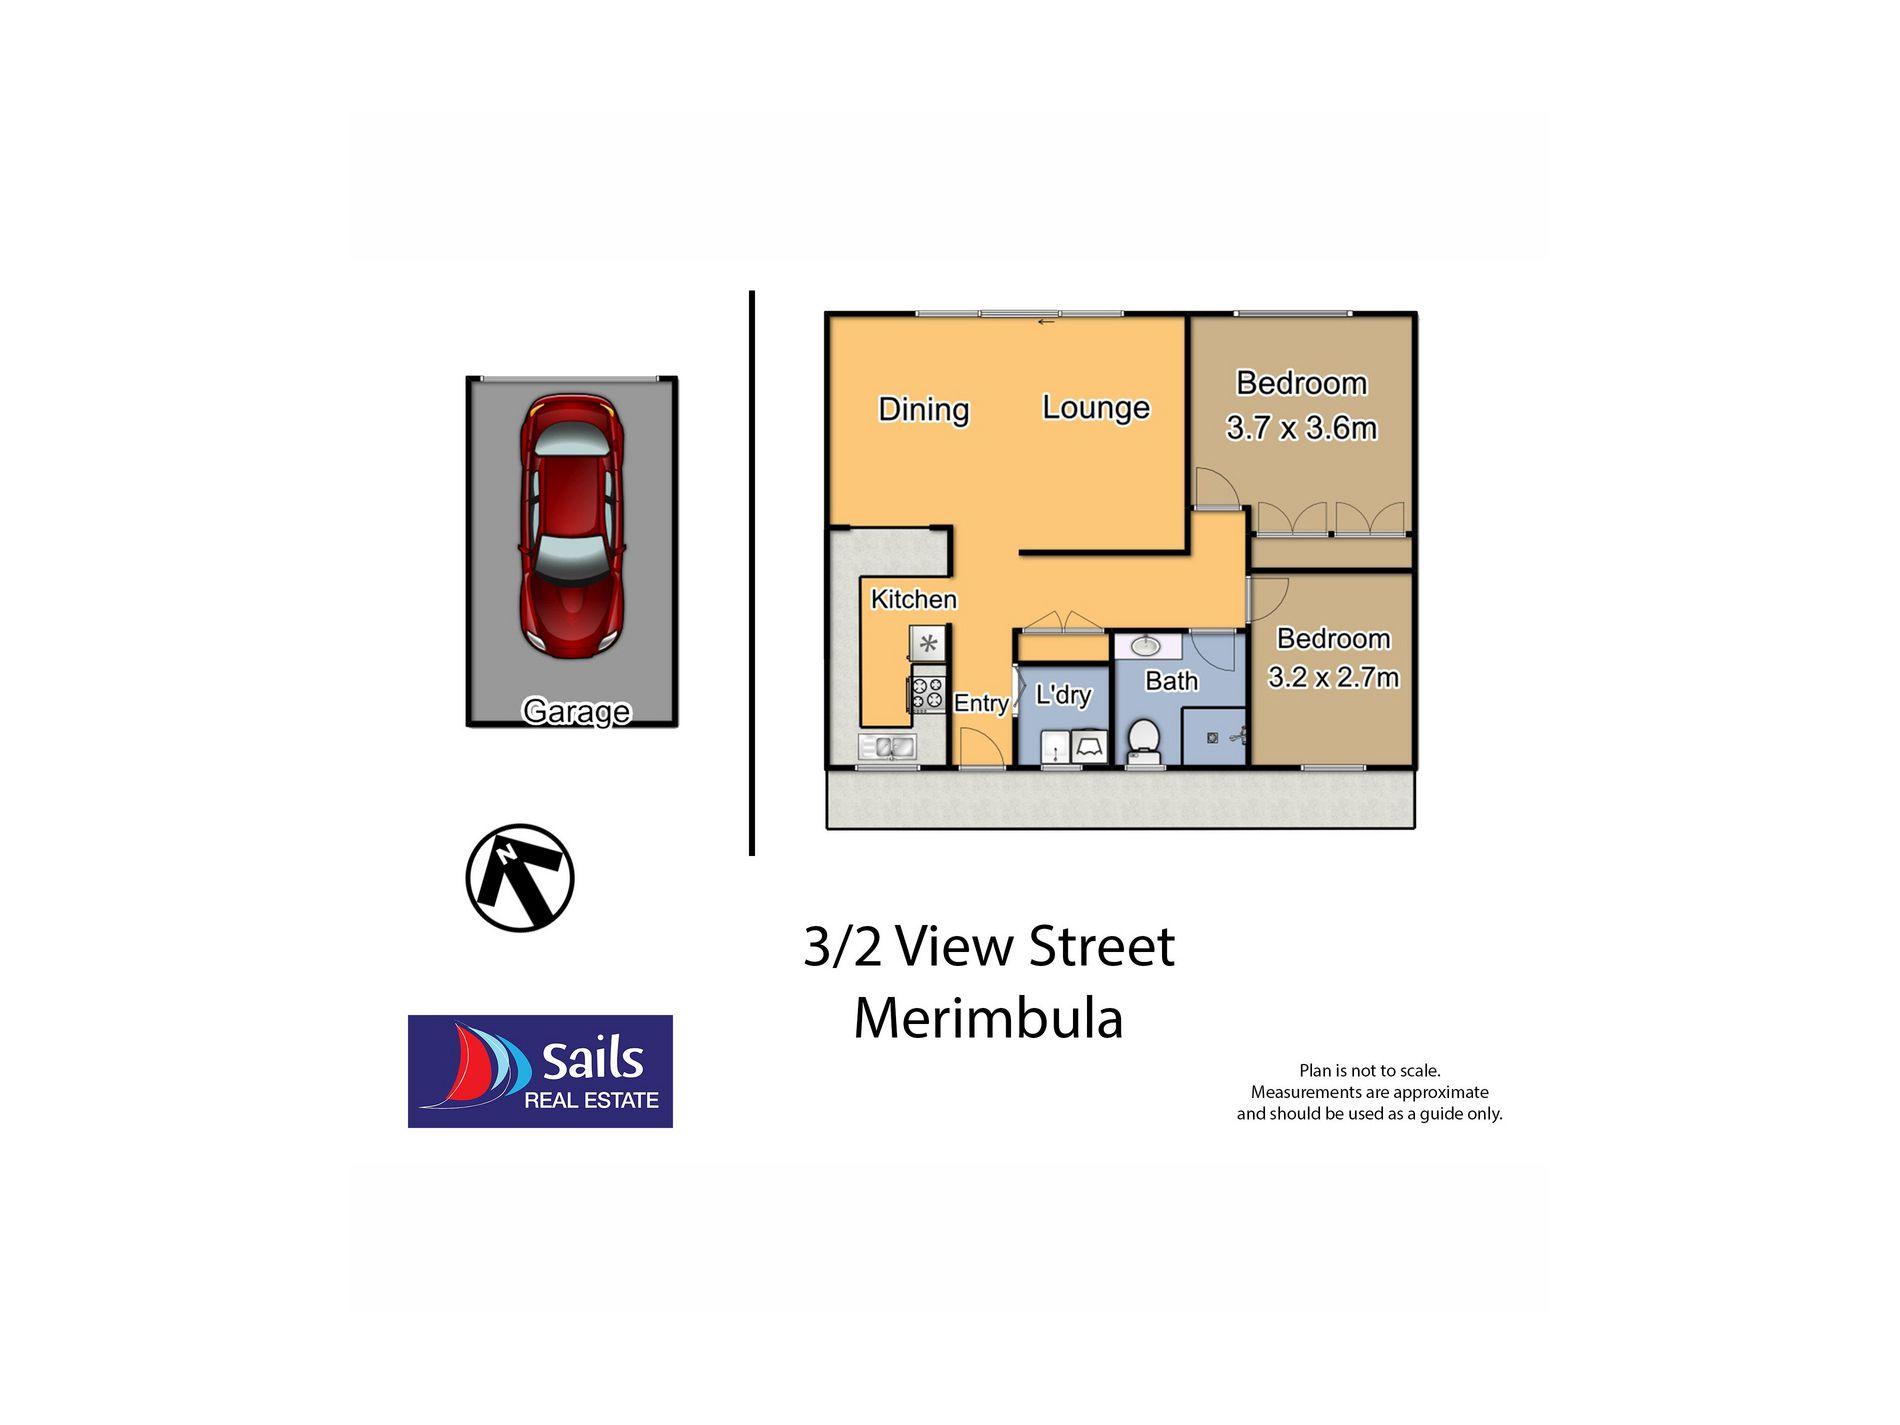 3 / 2 View Street, Merimbula